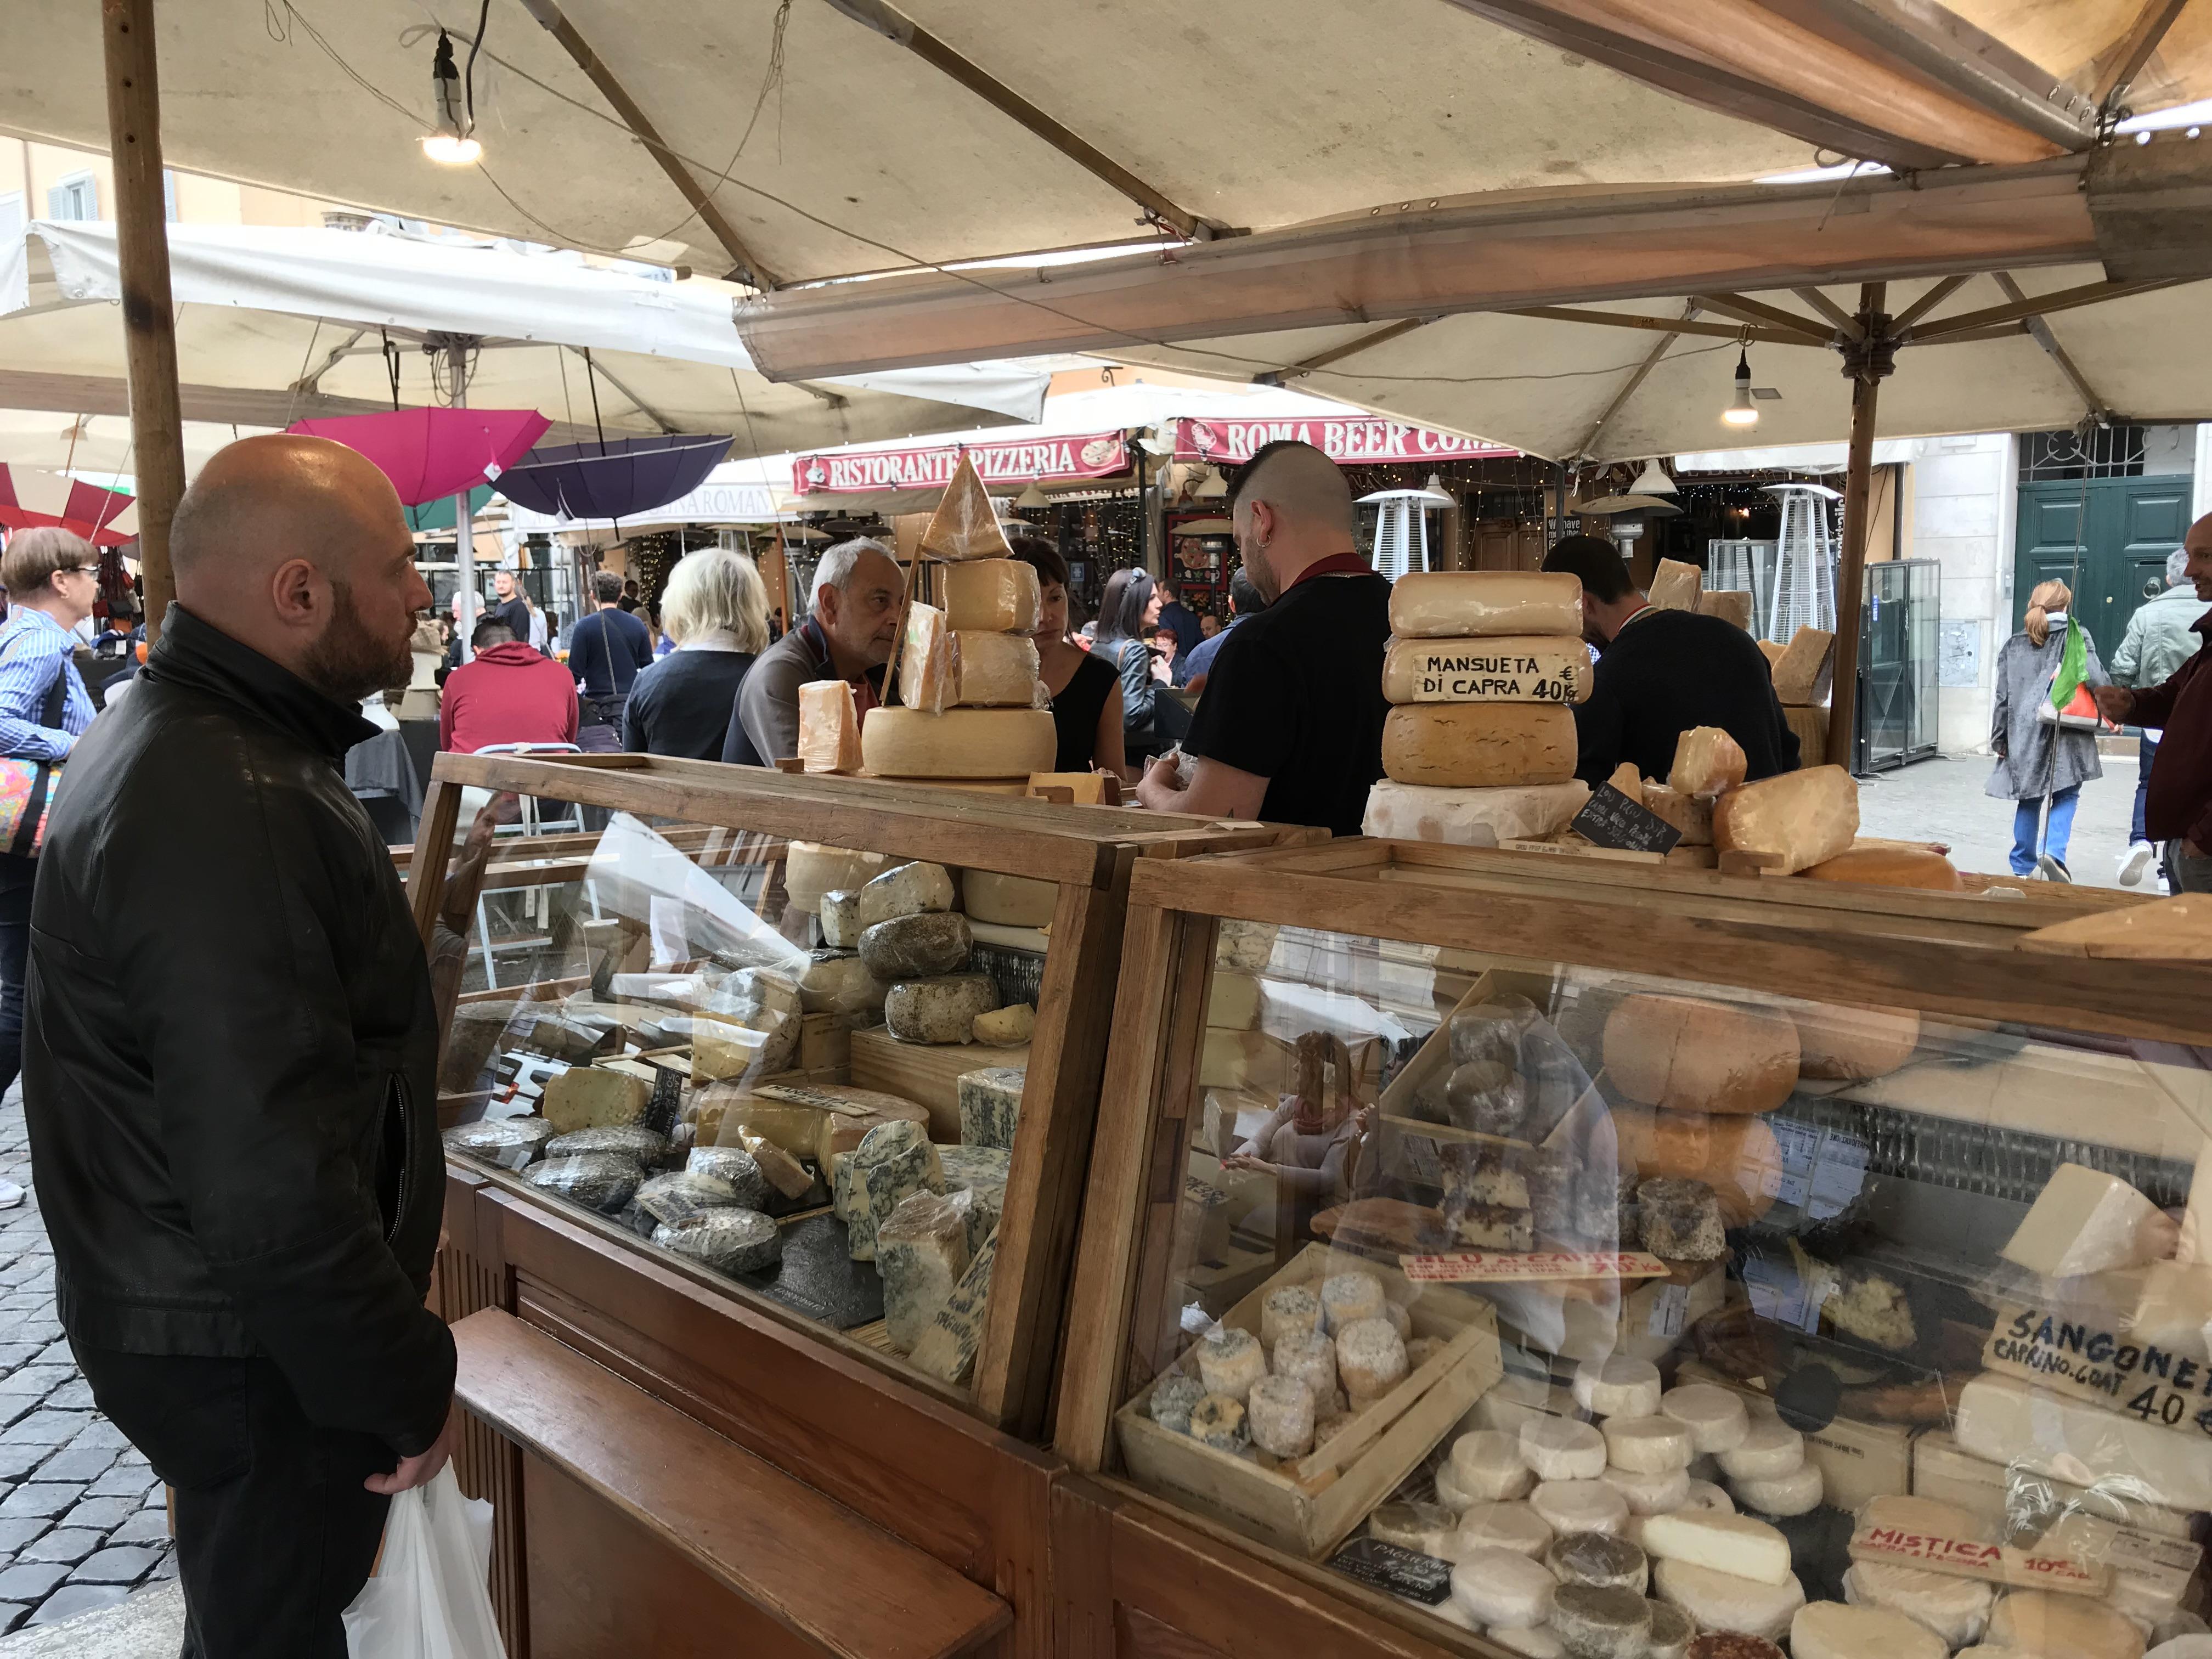 A cheese vendor during the Sunday market in Campo Di Fiori in Roma. Photo by Ryan Bedford.